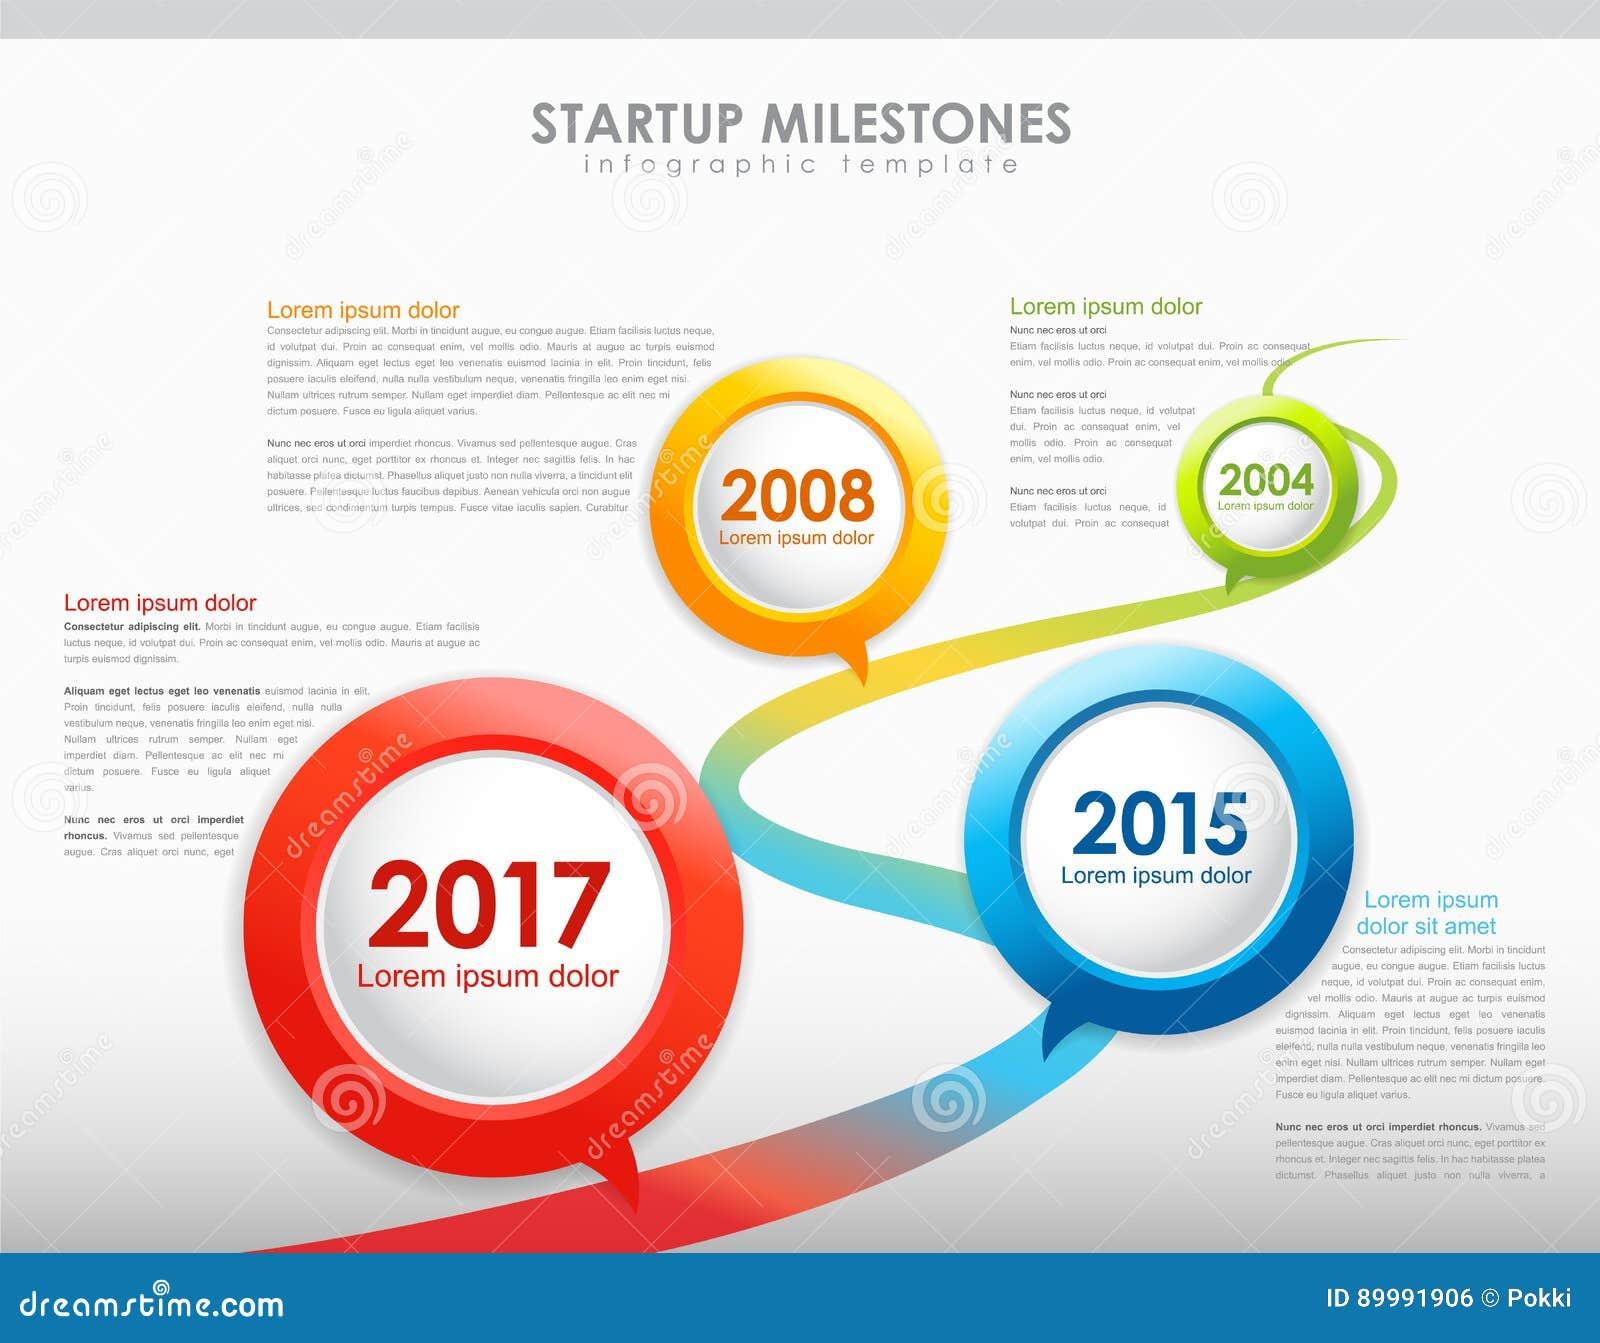 Infographic startup milestones timeline template stock for Startup milestone template